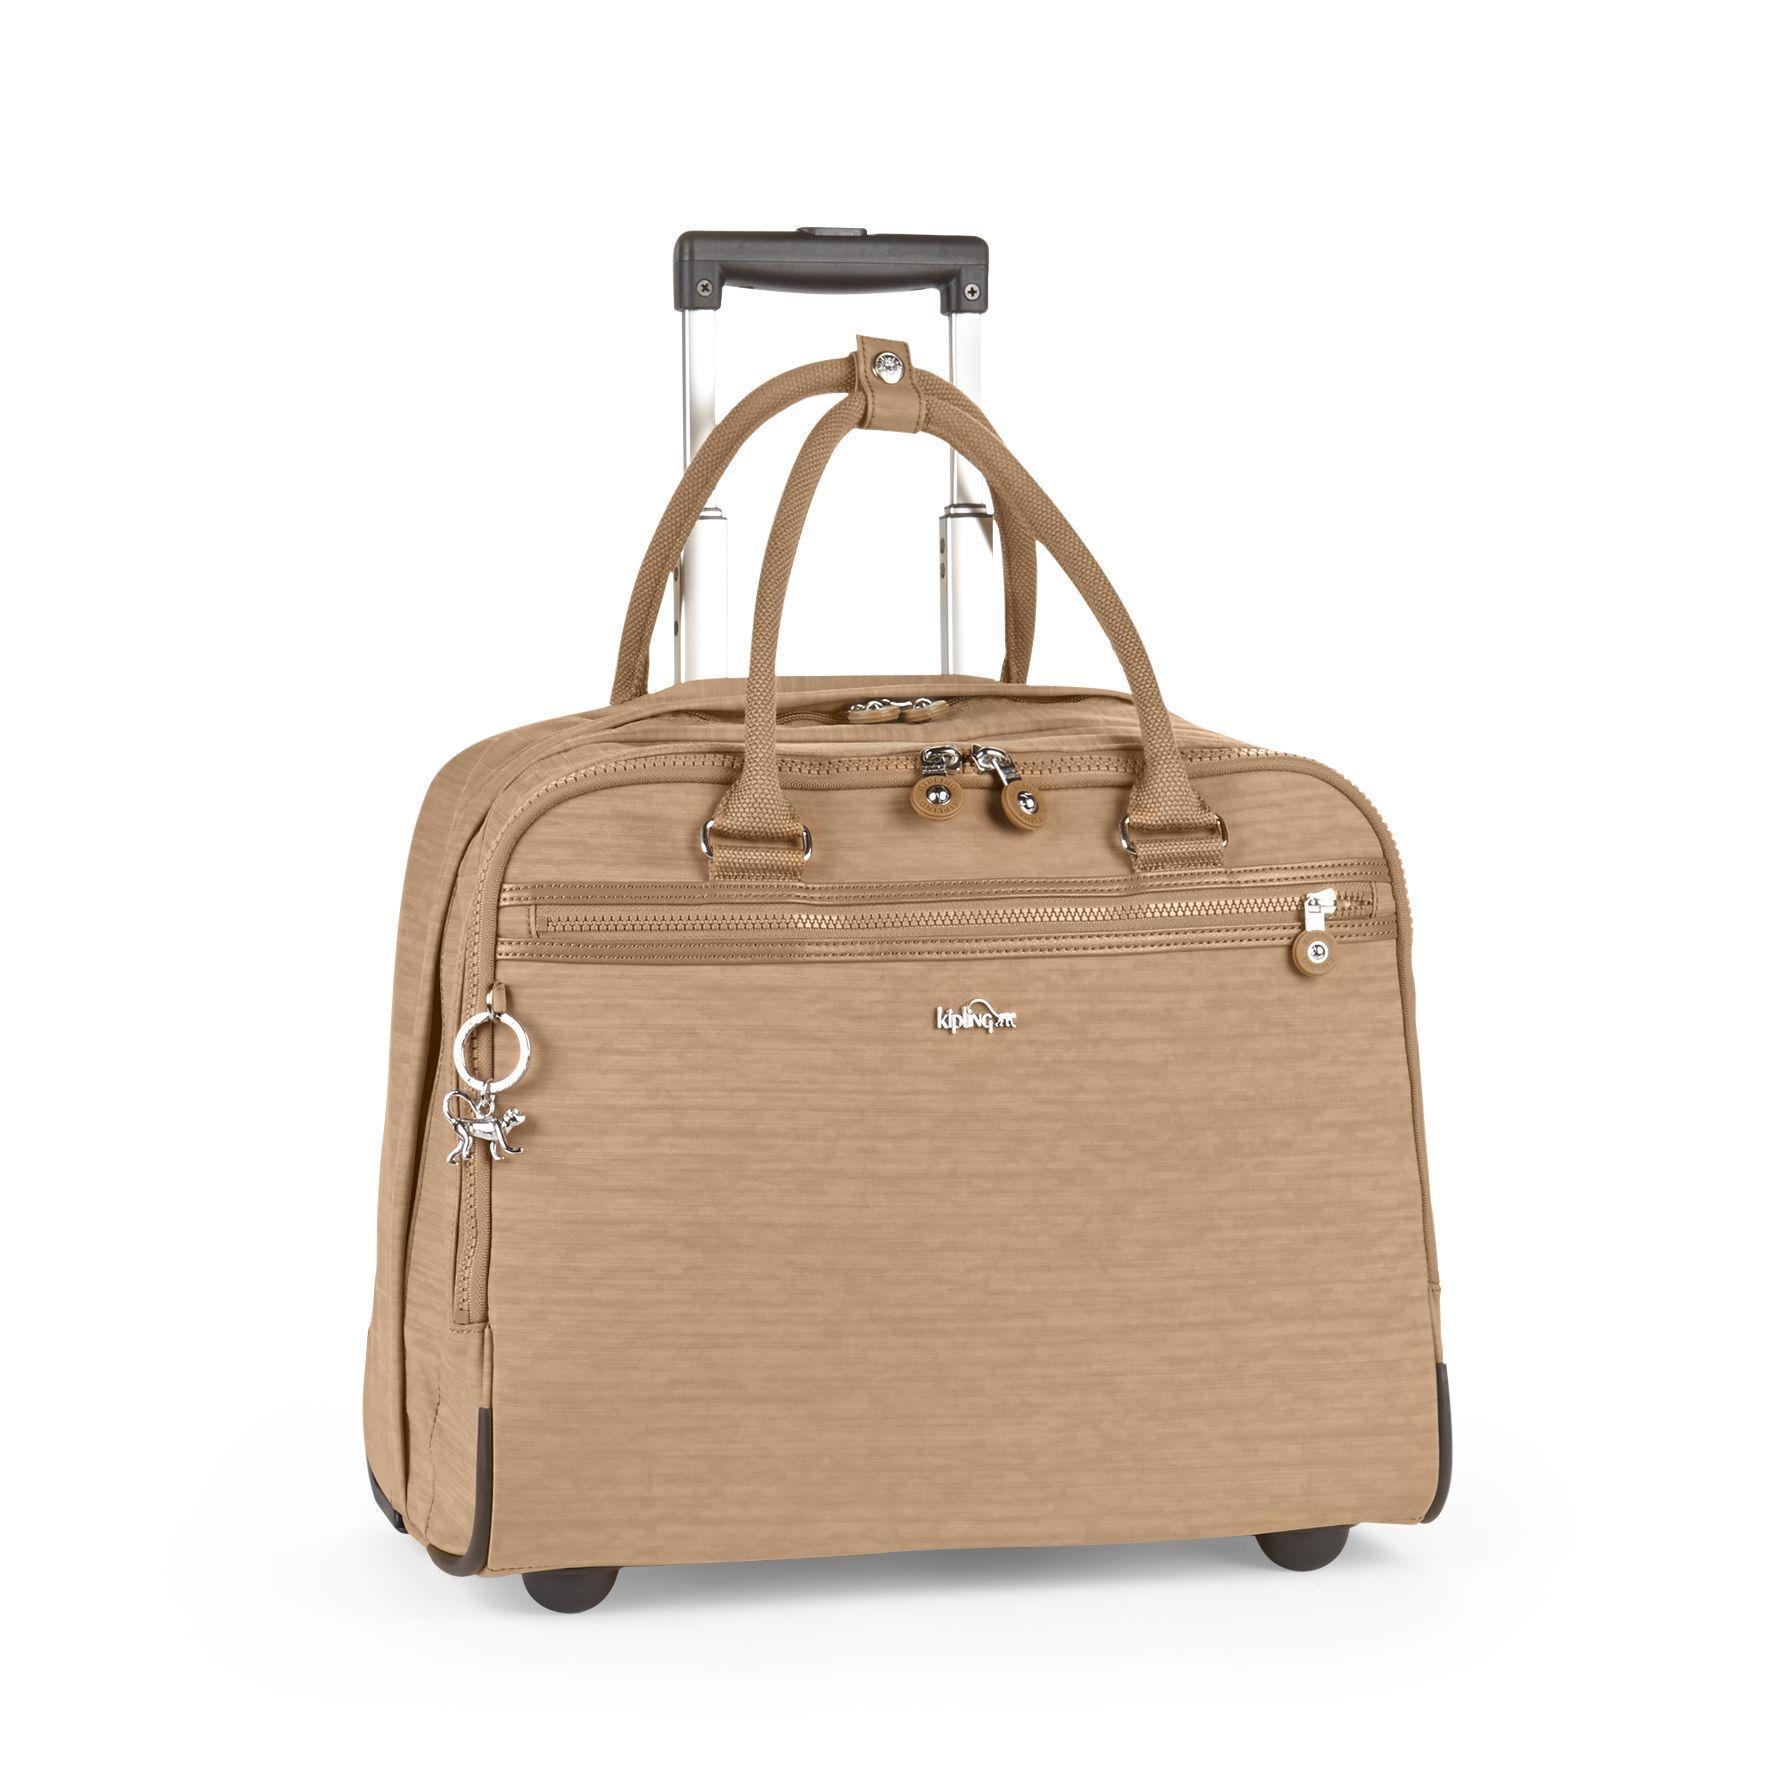 Kipling Travel Bag Work bag, Bags, Laptop protection